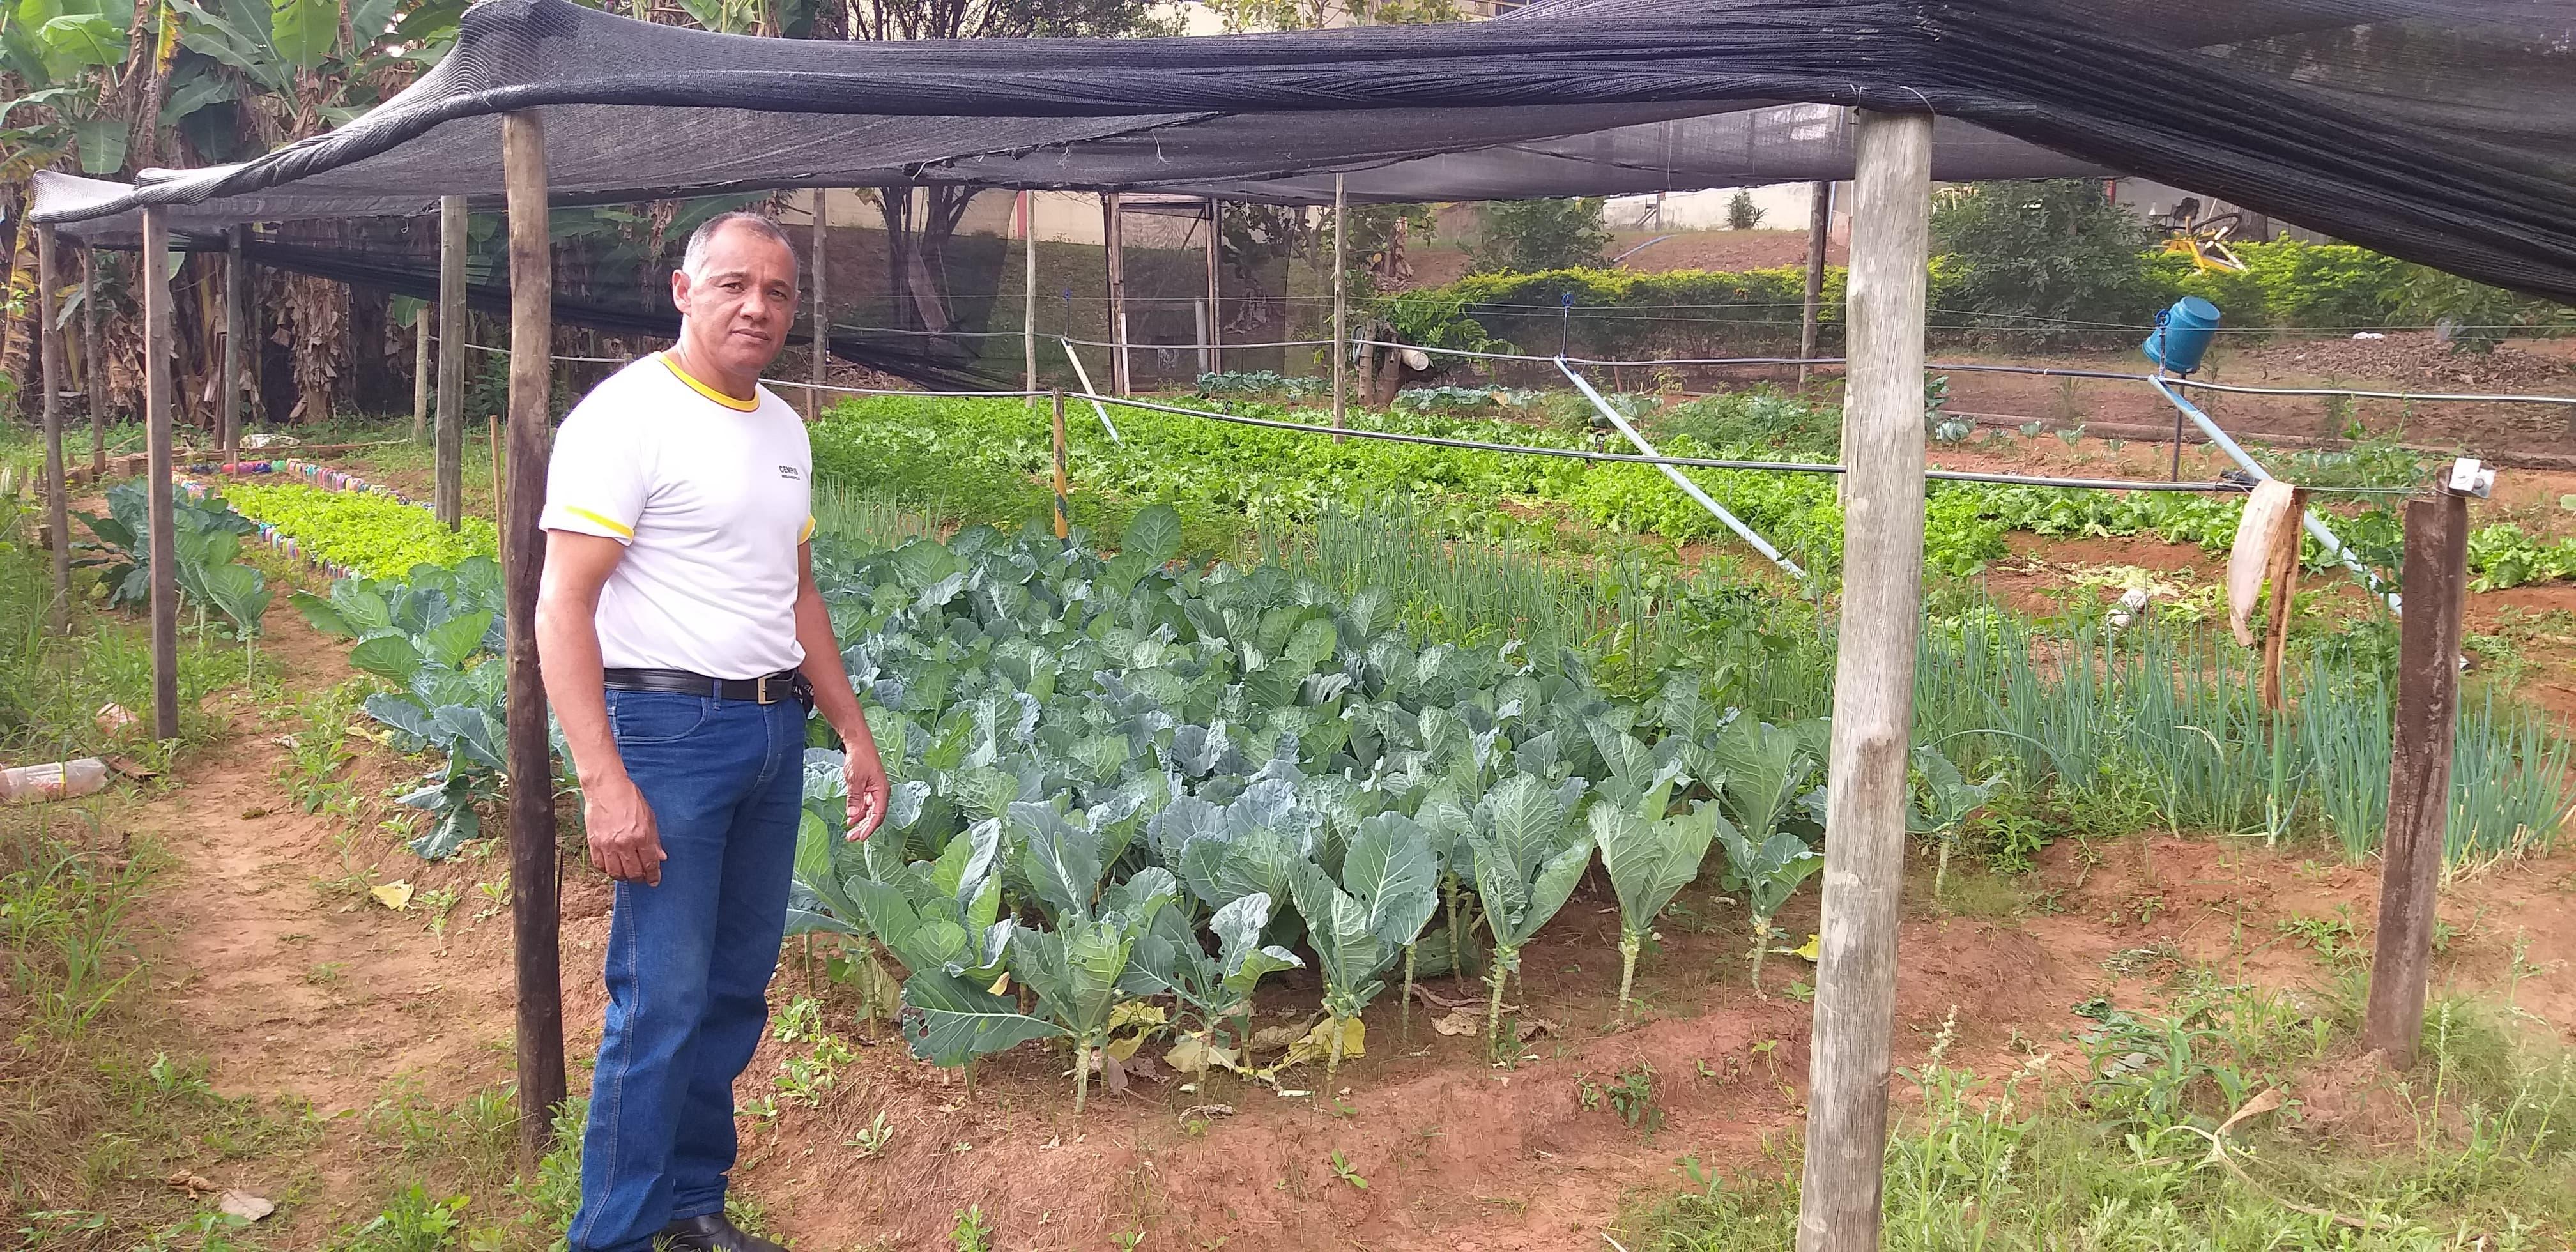 Escola Hélio Faria transforma local ocioso em horta